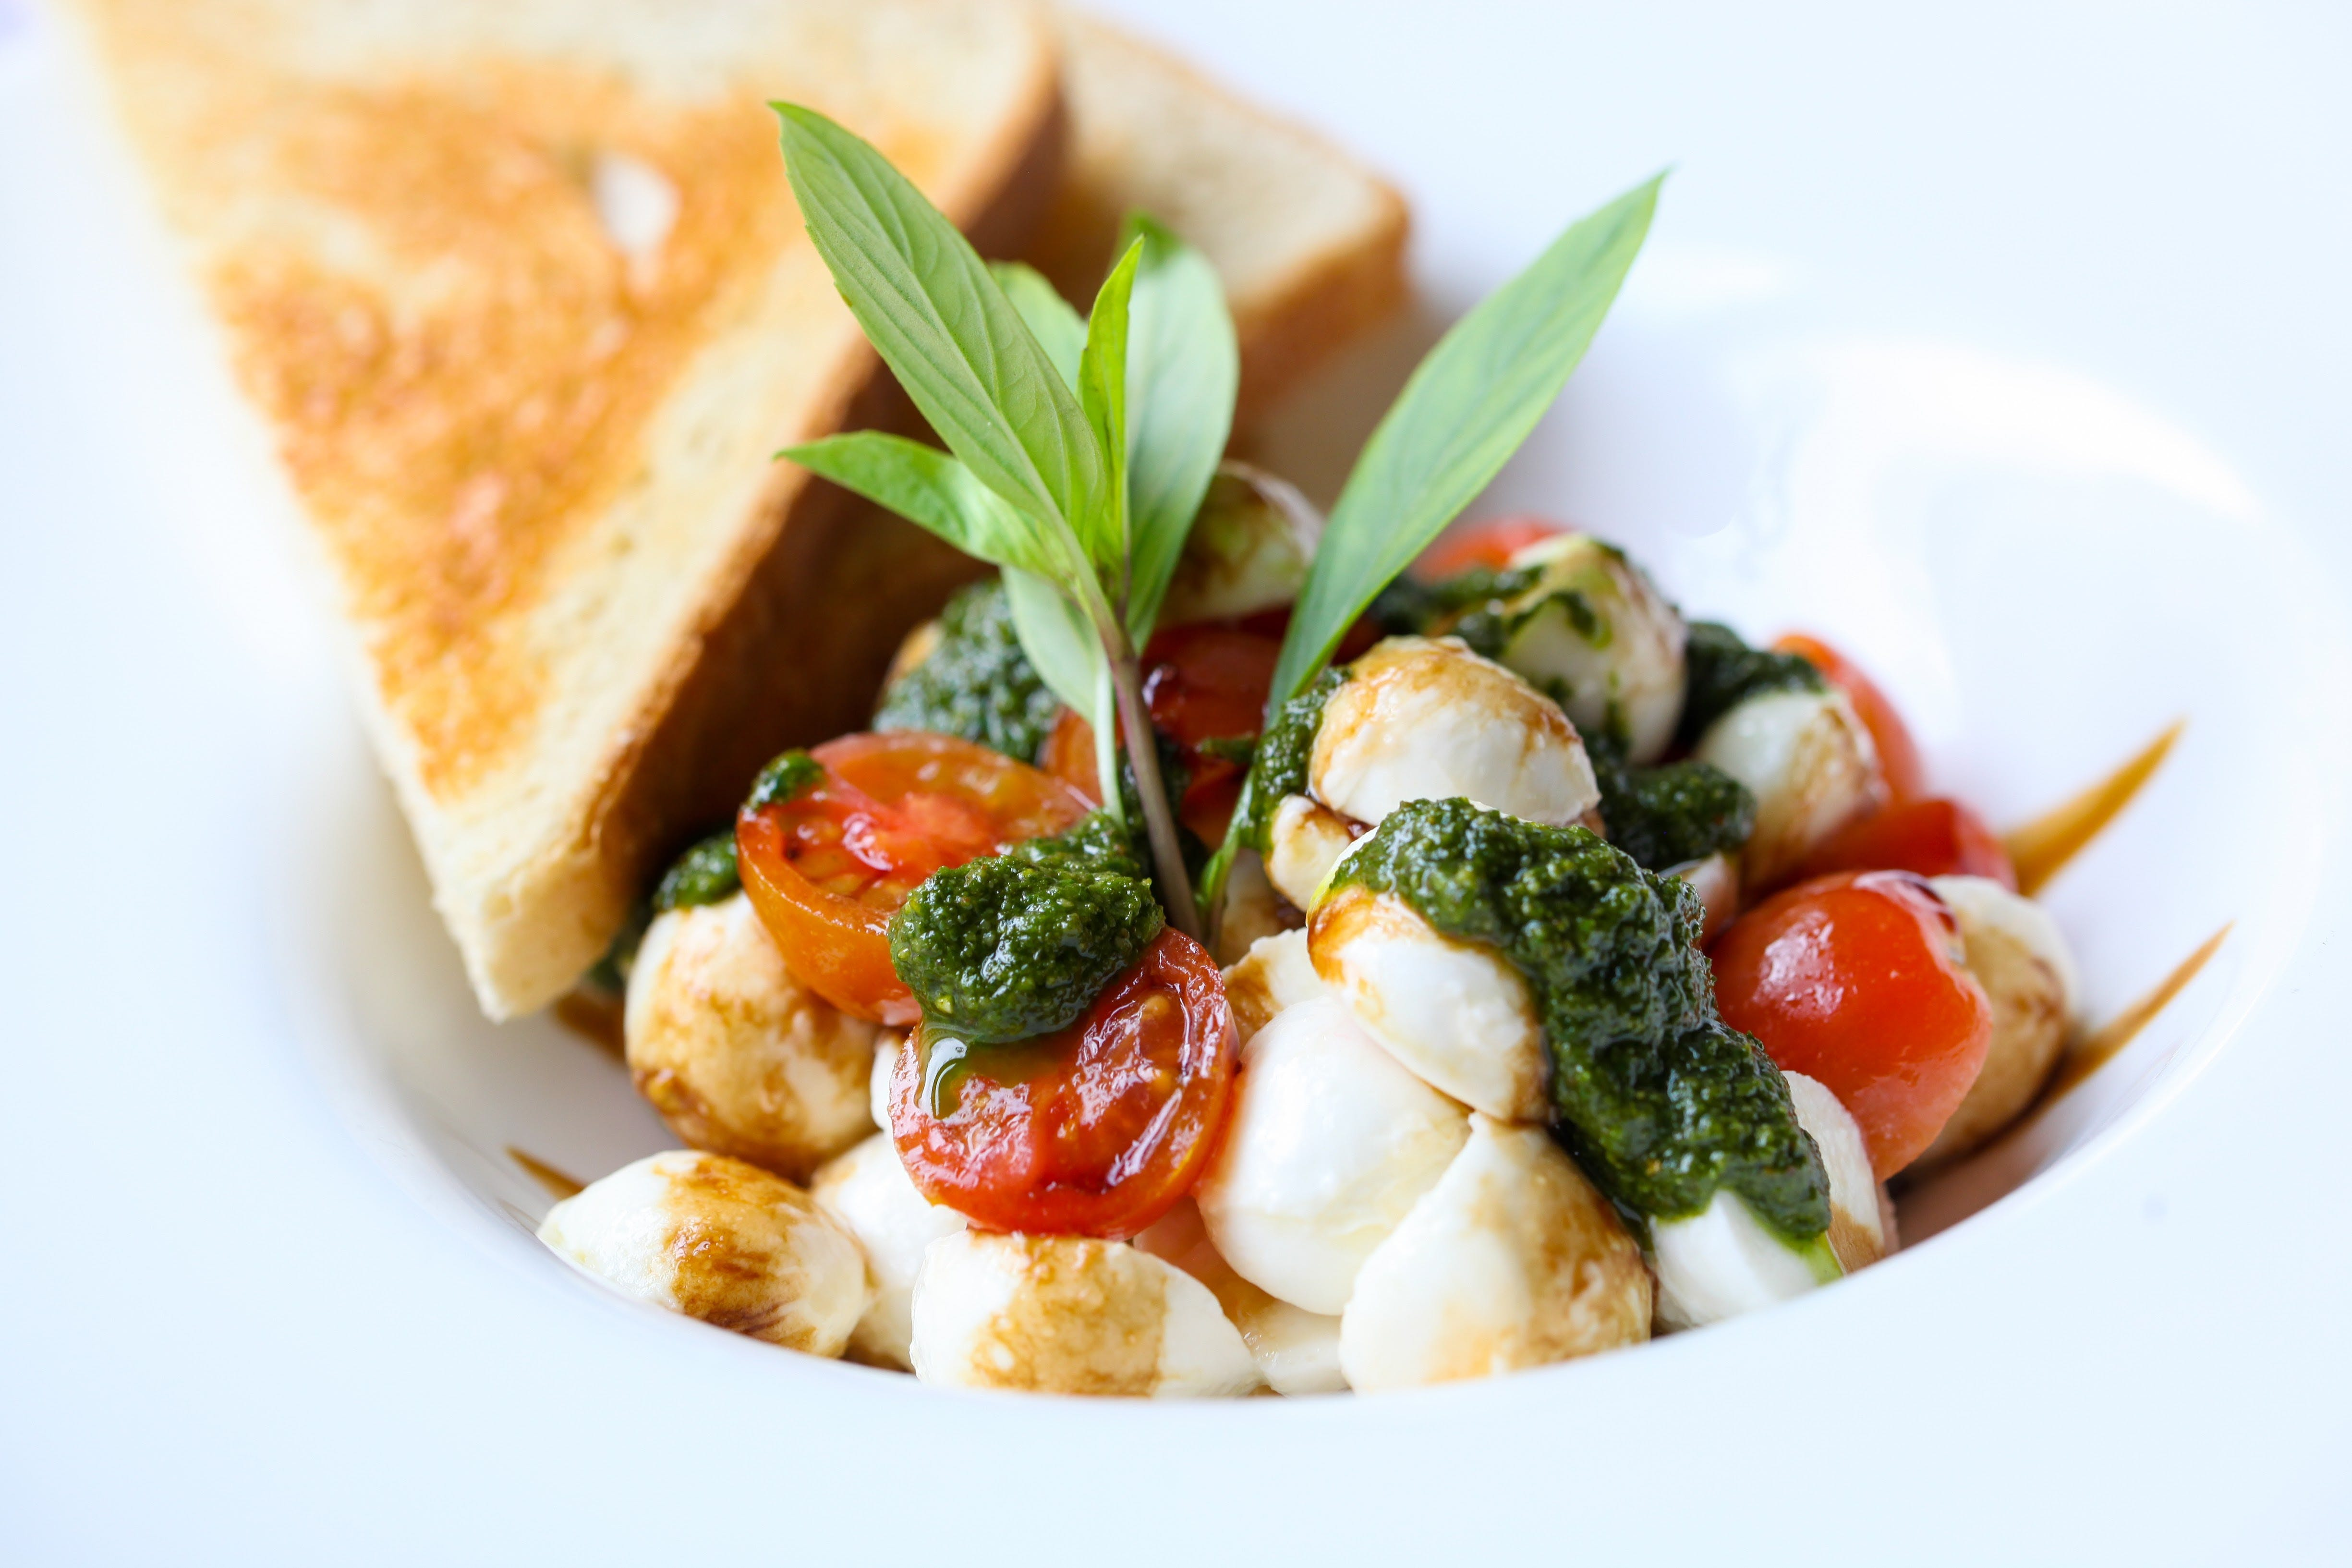 zu appetizer, basilikum, caprese, ernährung